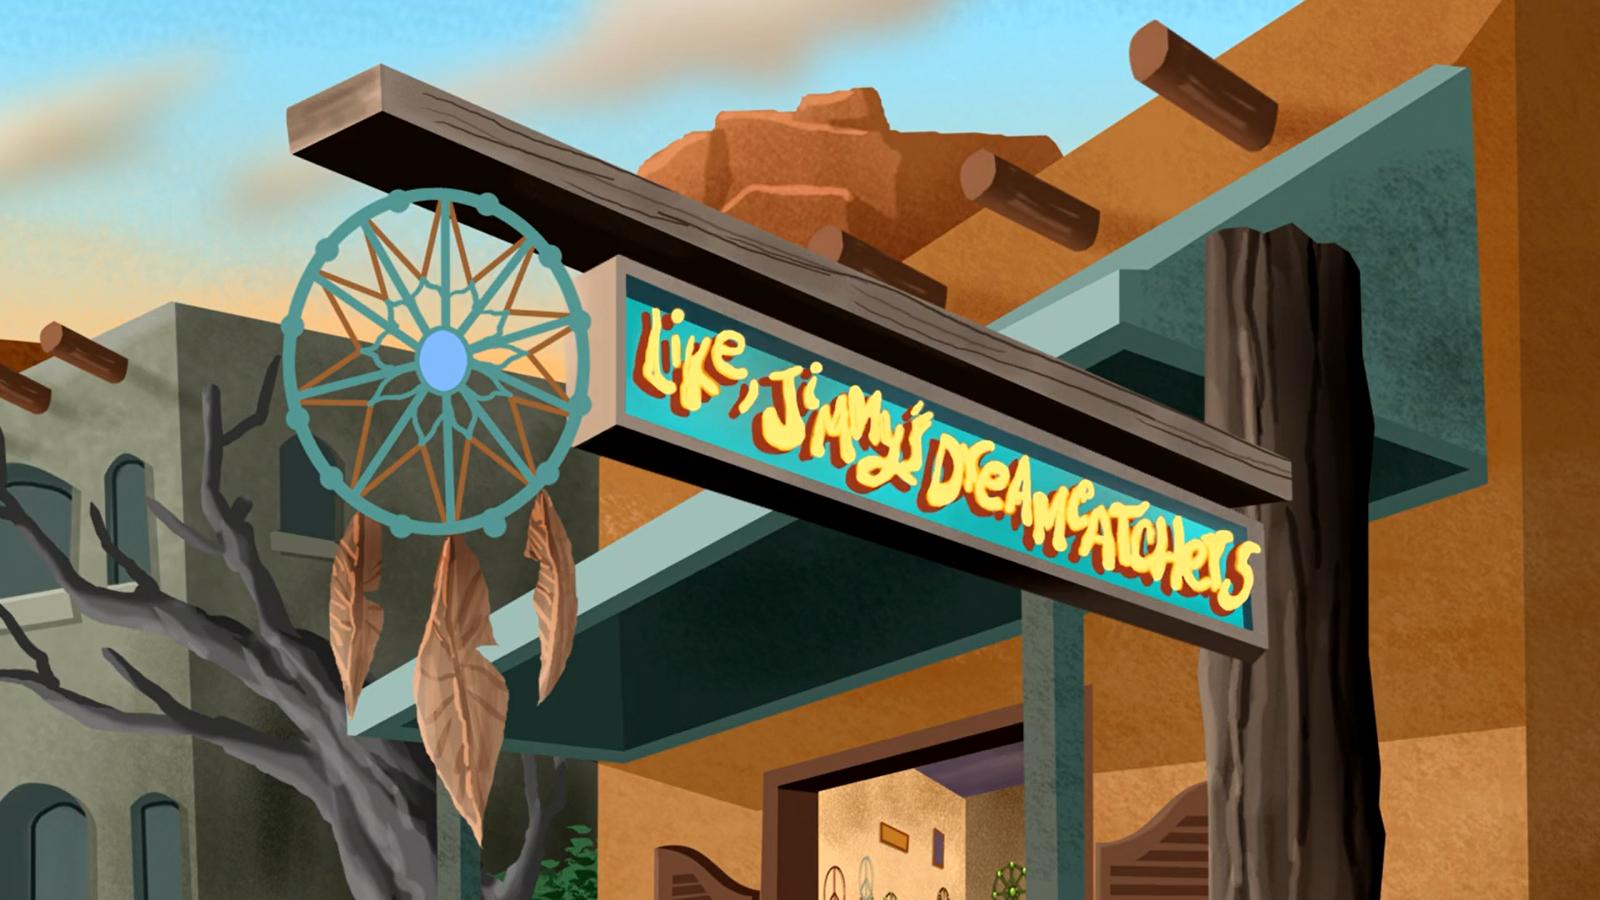 File:Like, Jimmy's Dreamcatchers.png